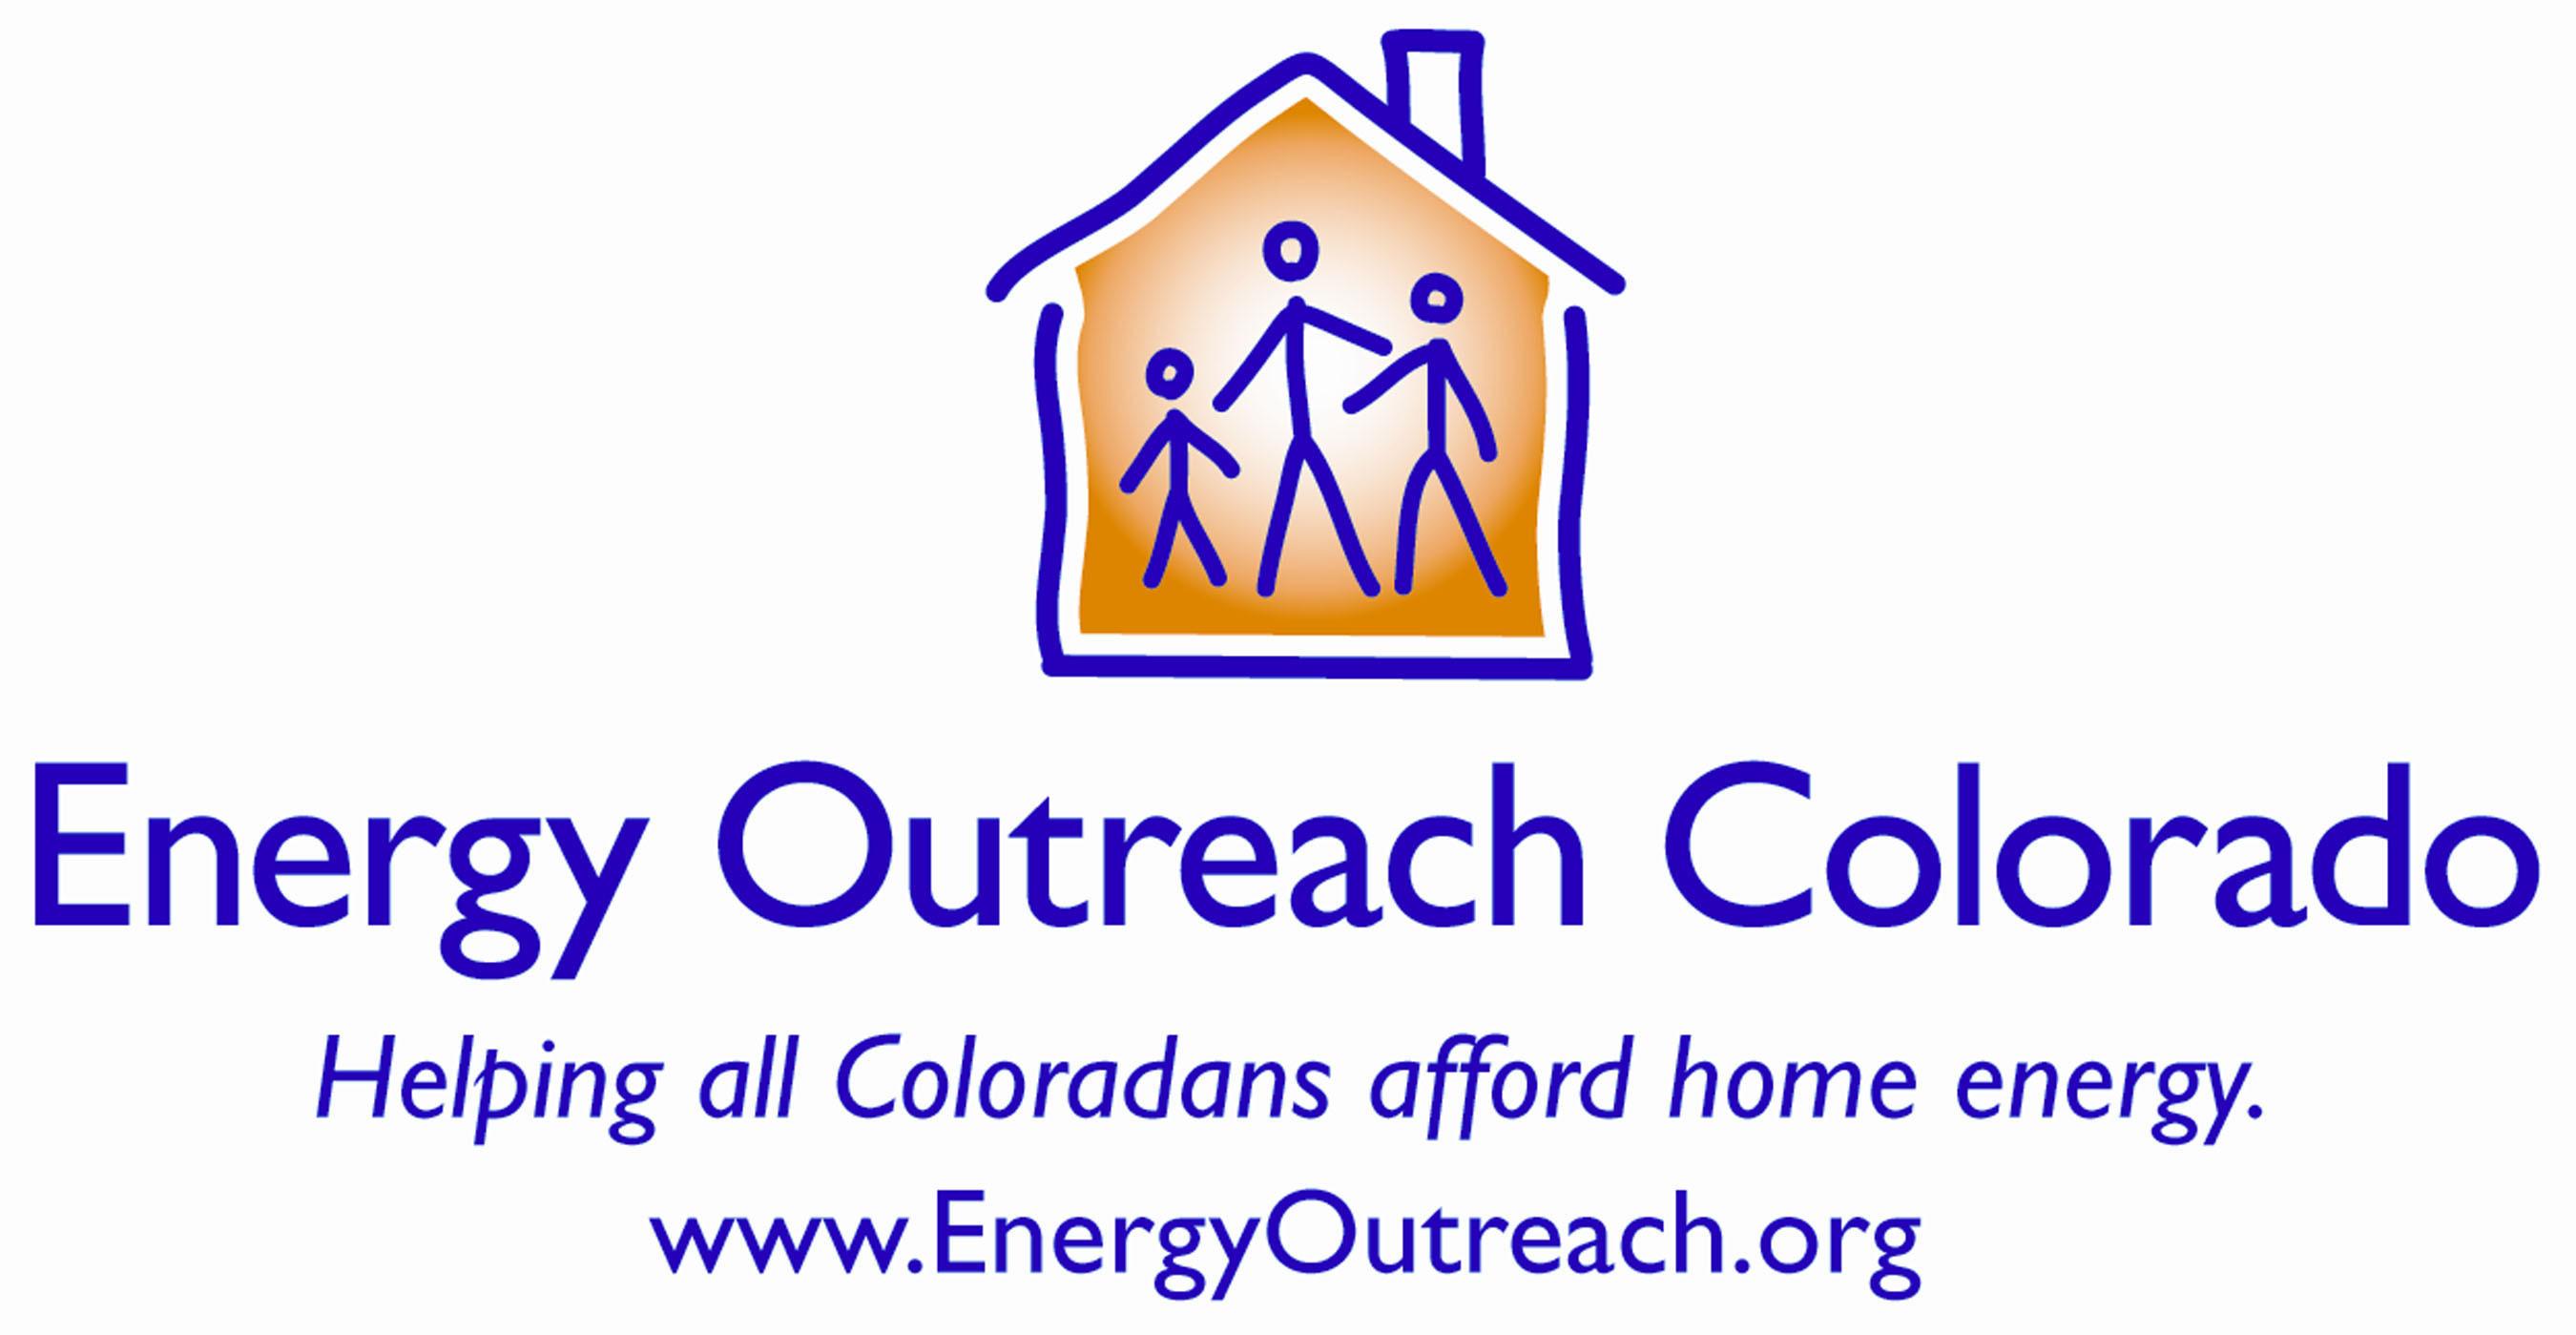 Energy Outreach Colorado logo.